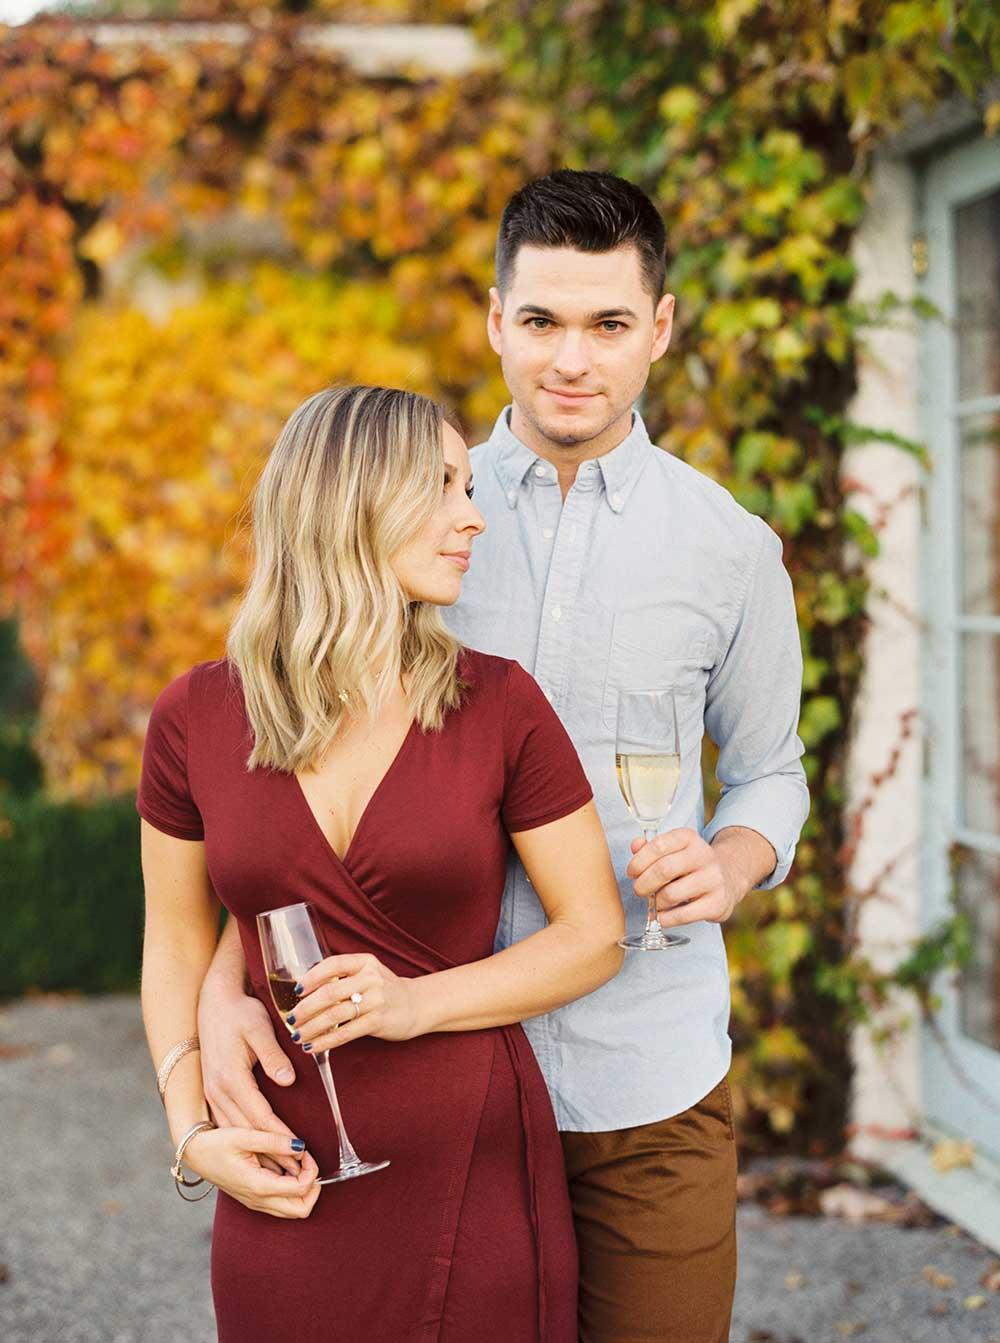 monet-vineyards-engagement-photographer-015.jpg